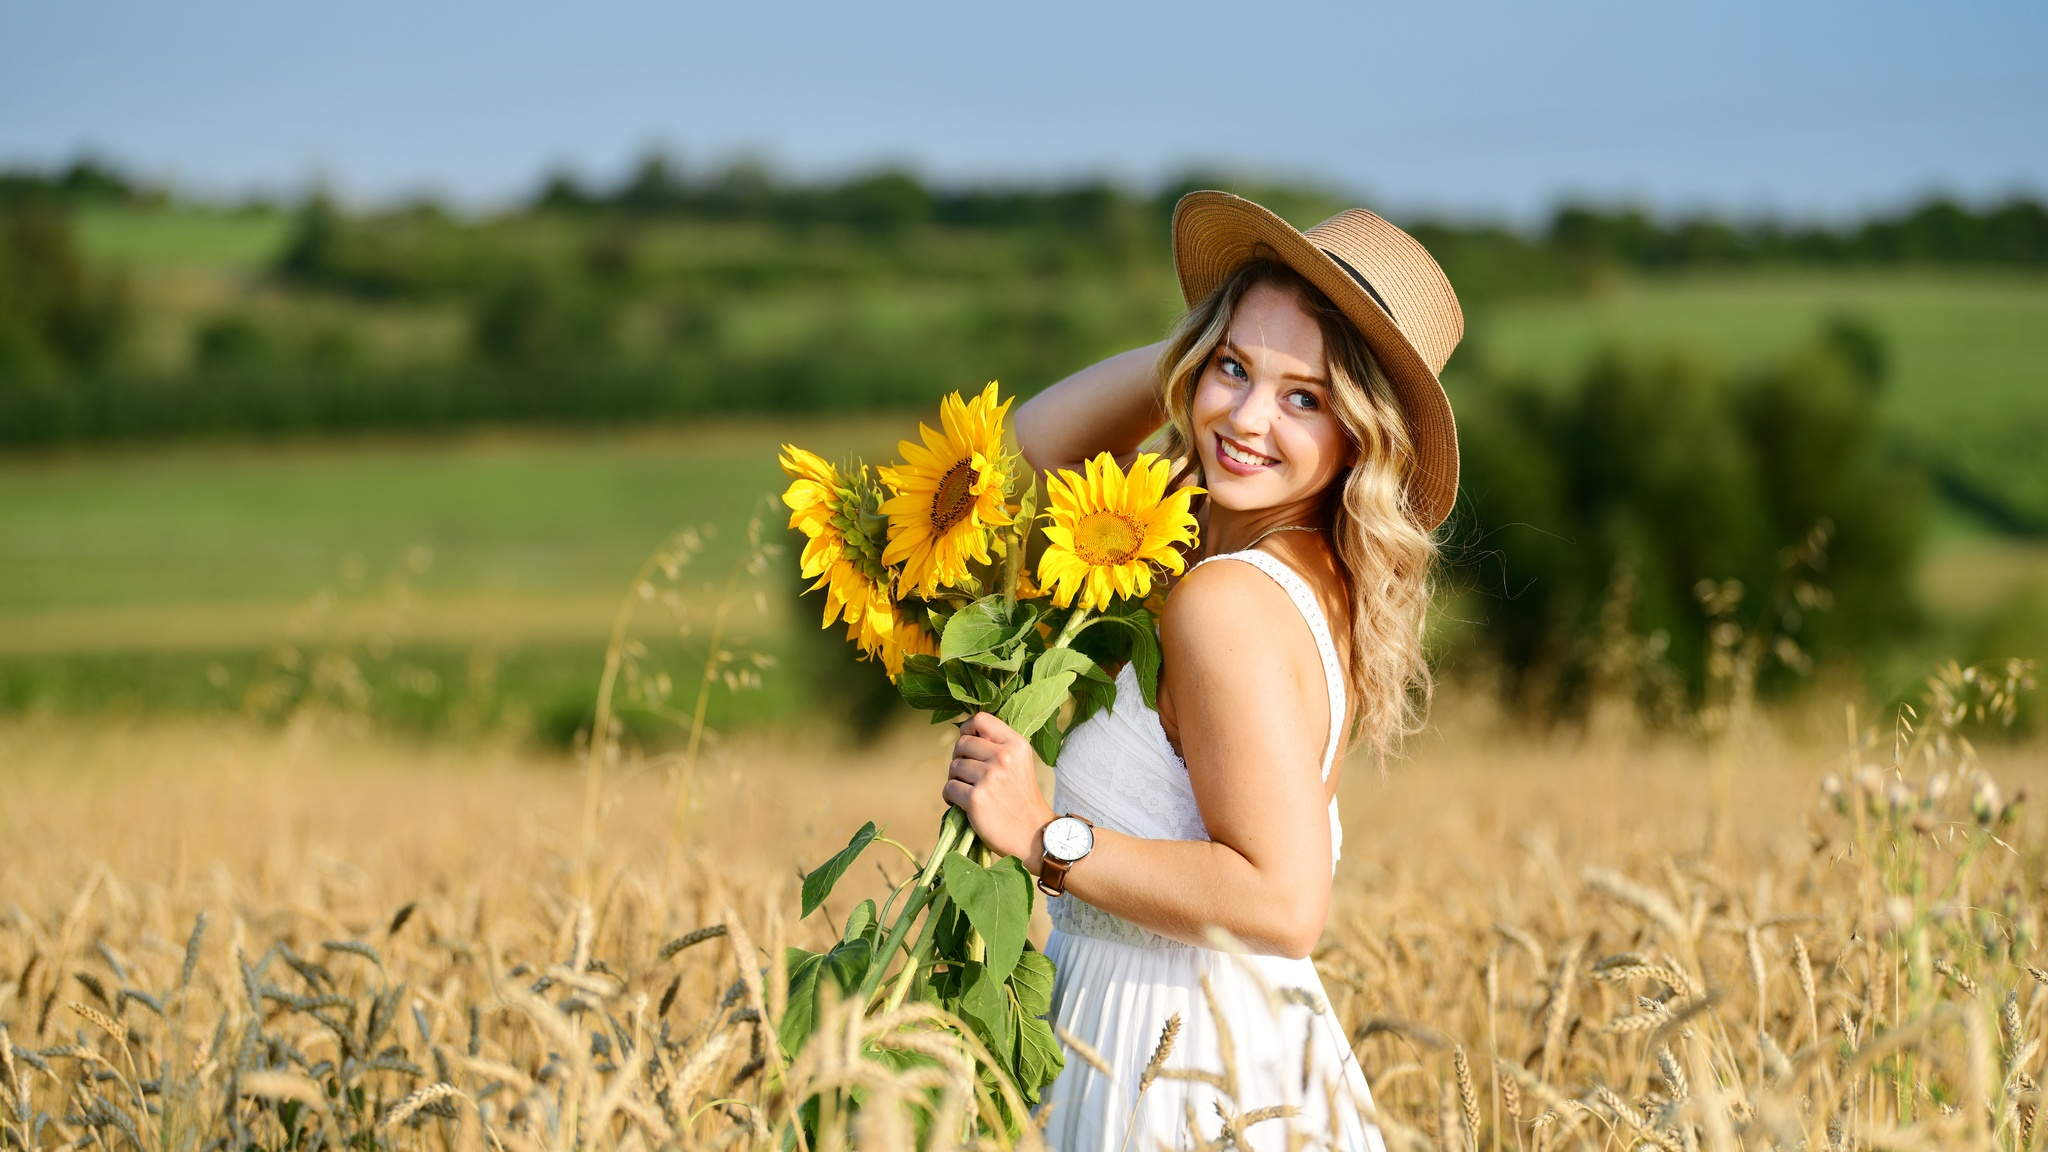 girl-in-field-with-flowers-sunny-day-8k-kz.jpg